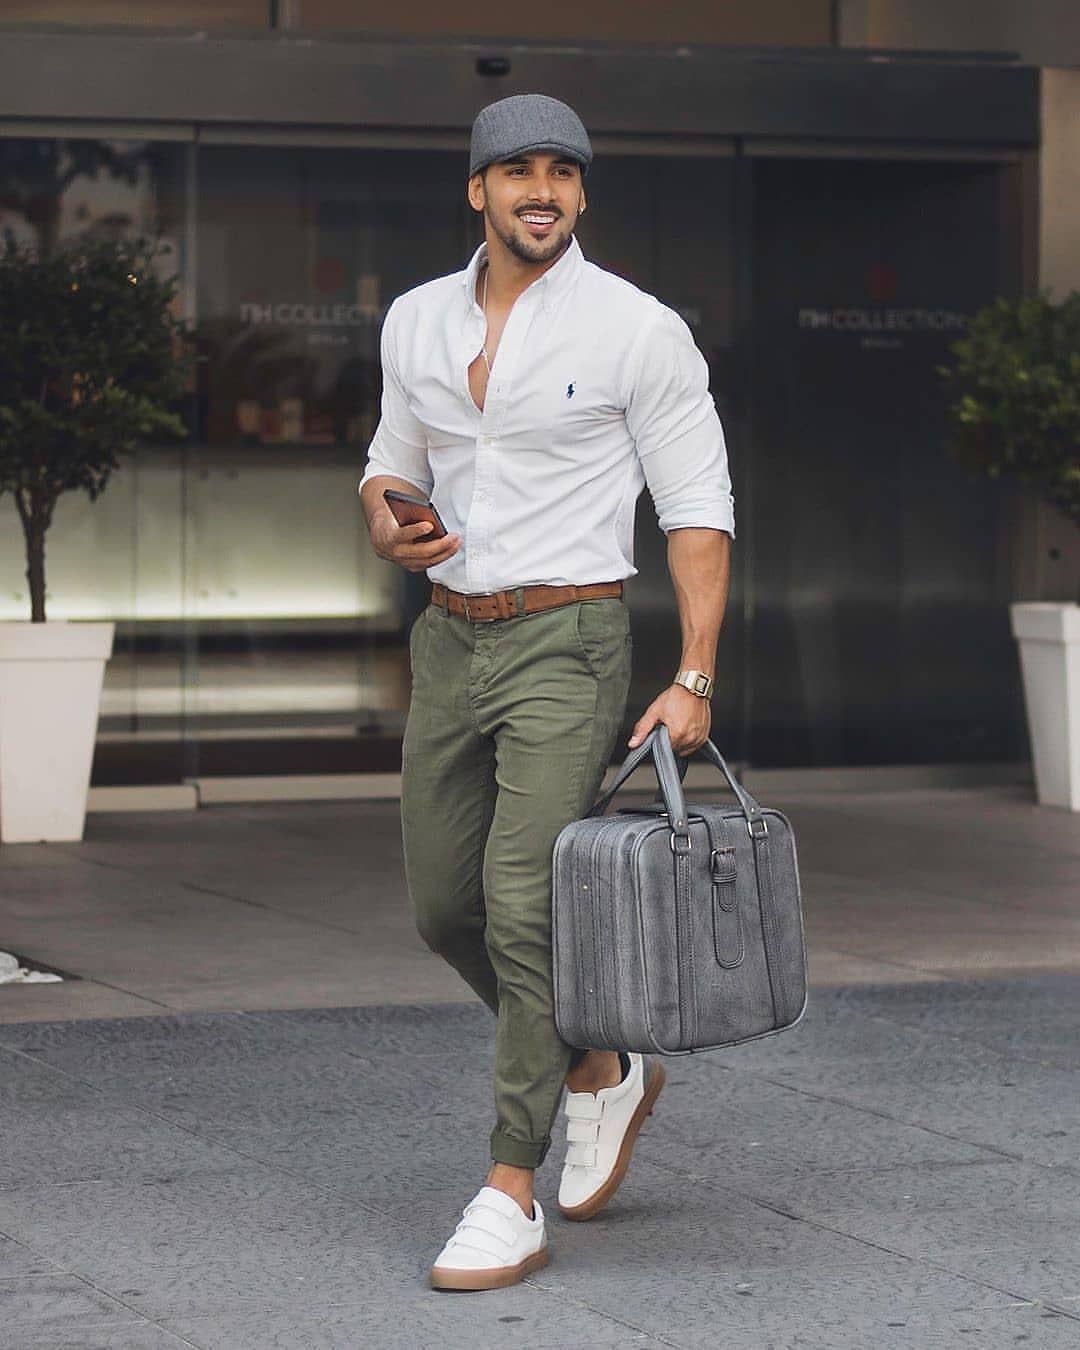 Men Style Fashion Look Clothing Clothes Man Ropa Moda Para Hombres Outfit Models Moda Masculina Urbano Mens Fashion Casual Big Men Fashion Mens Casual Outfits